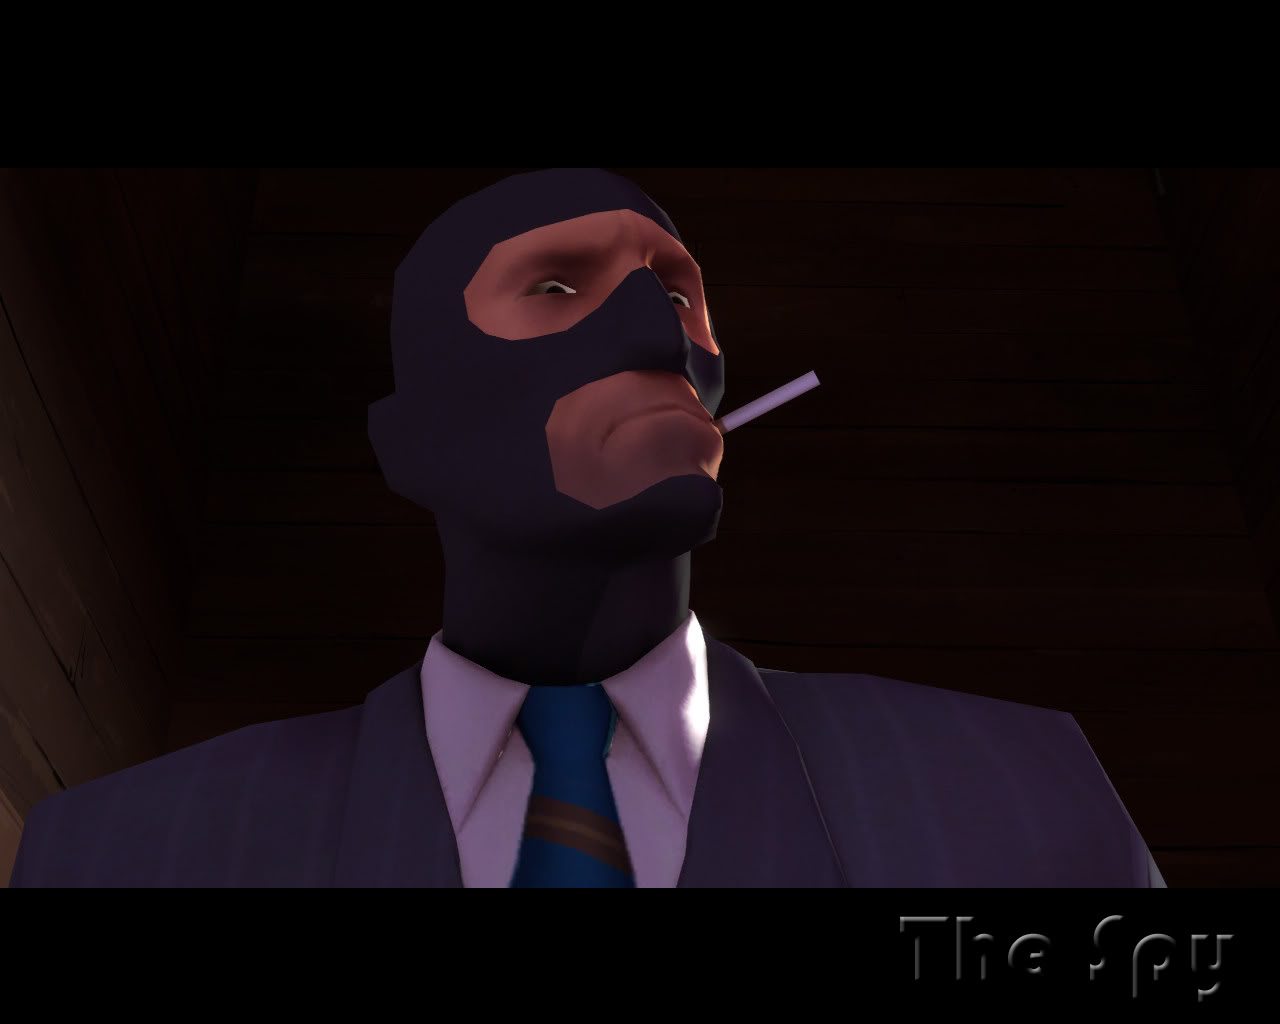 Spy Wallpaper Spy Desktop Background 1280x1024